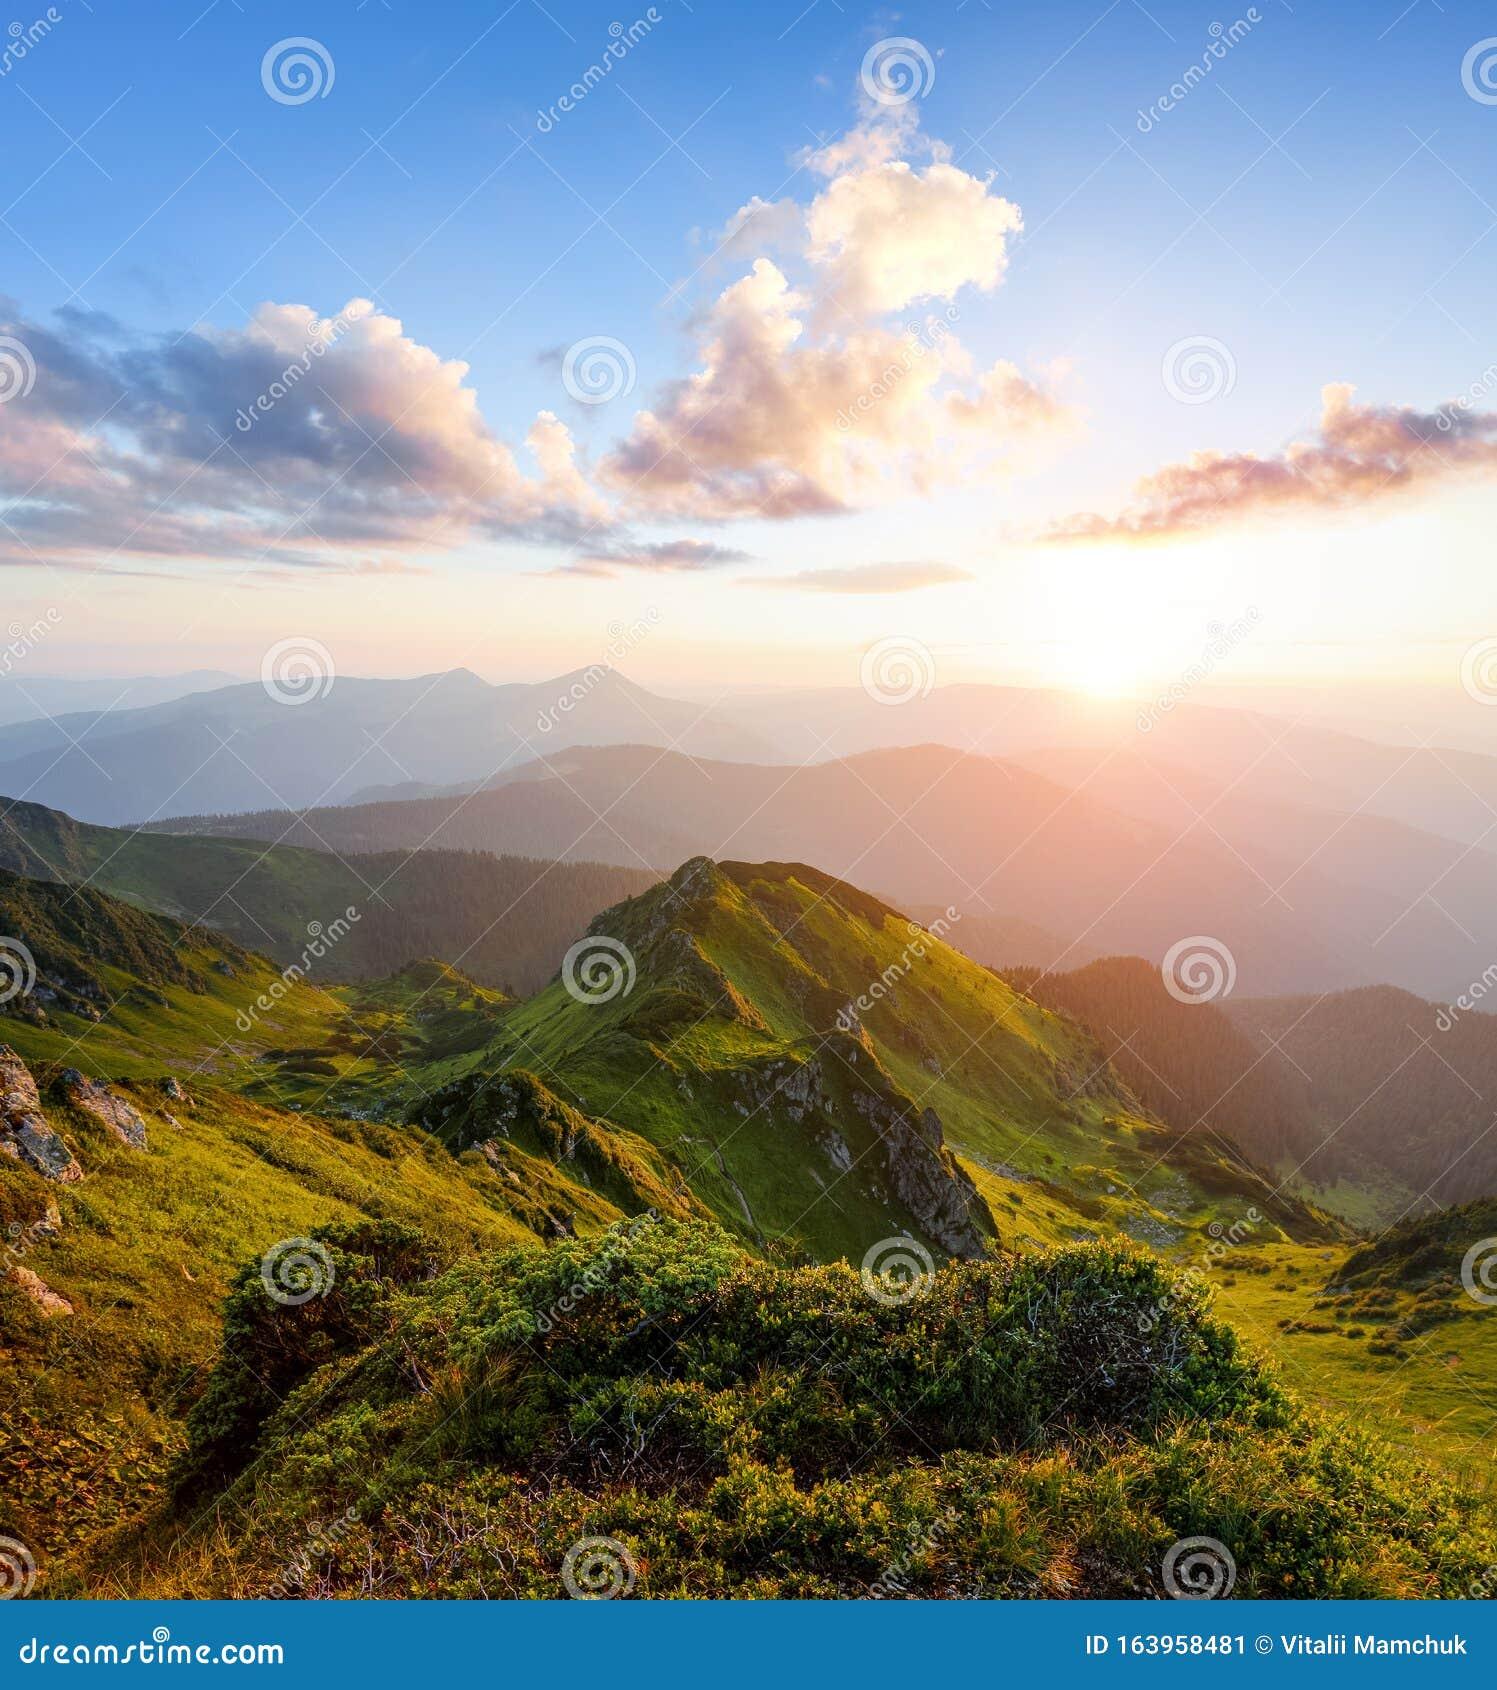 Spring Sunny Morning Mountain Landscape With Beautiful Sunrise